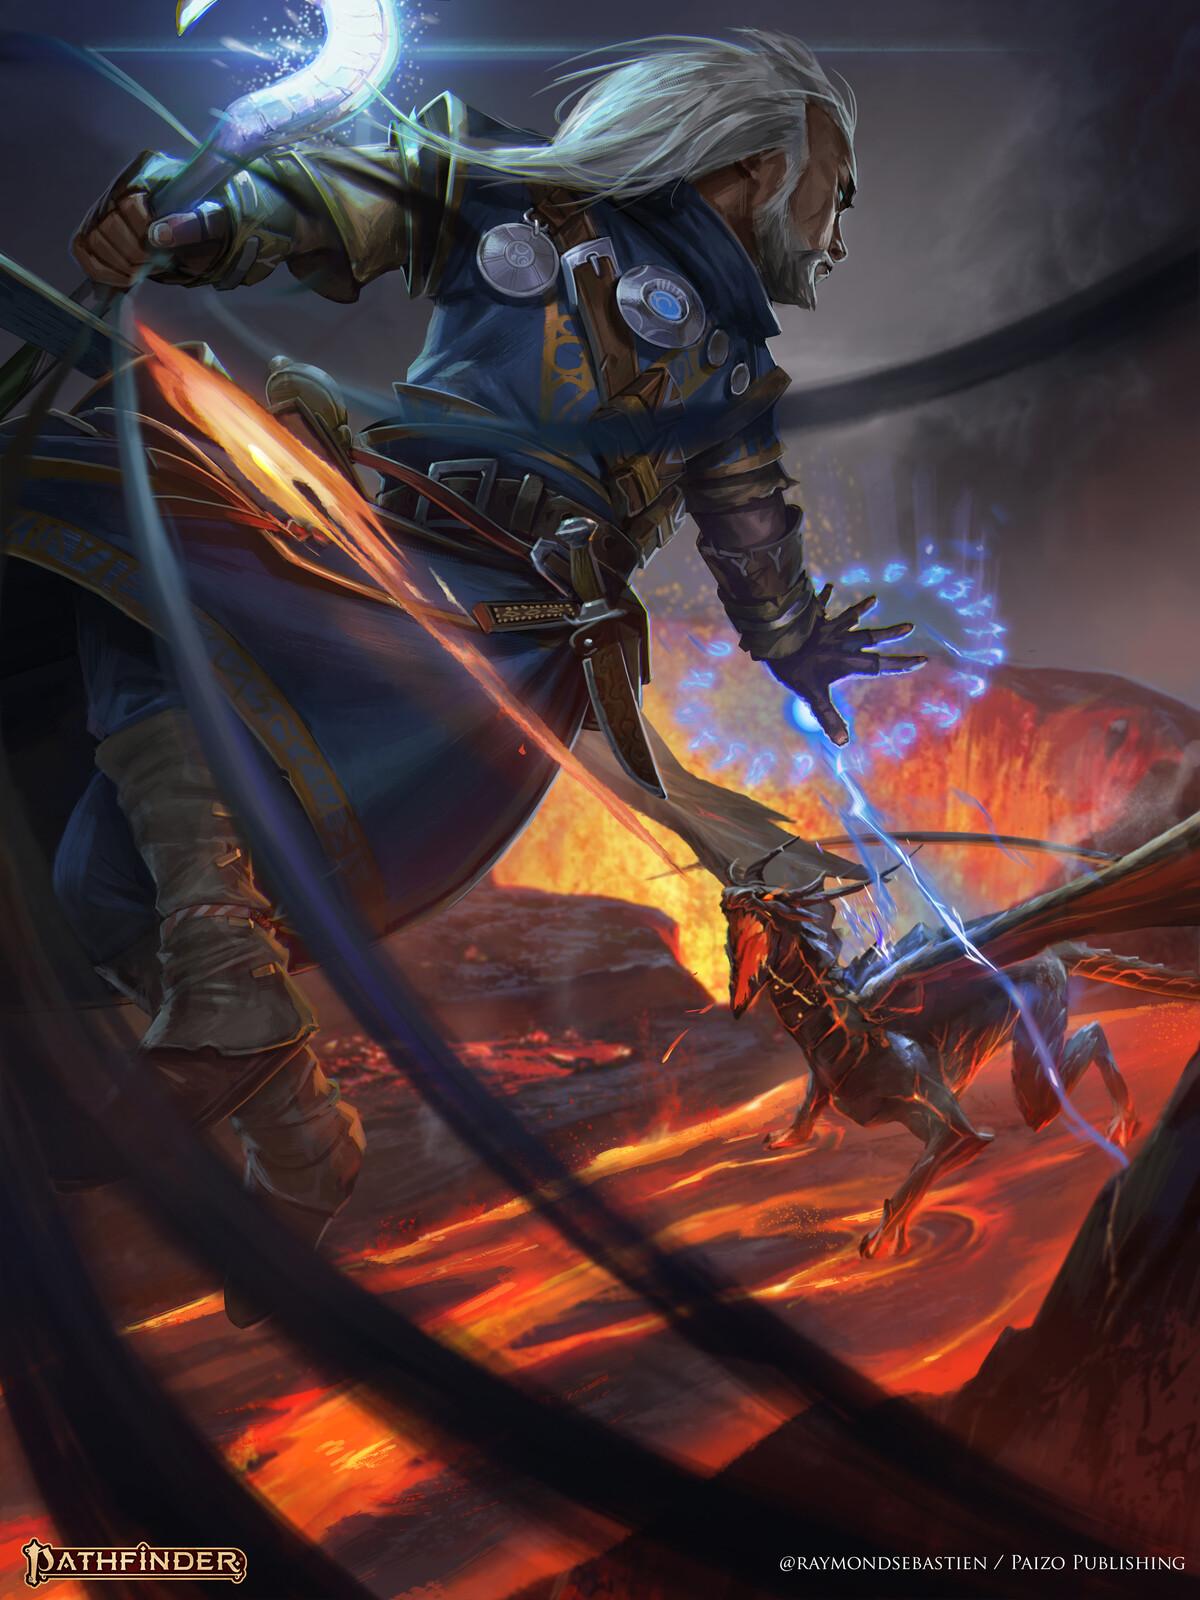 Pathfinder : Iconic Wizard vs Magma Dragon